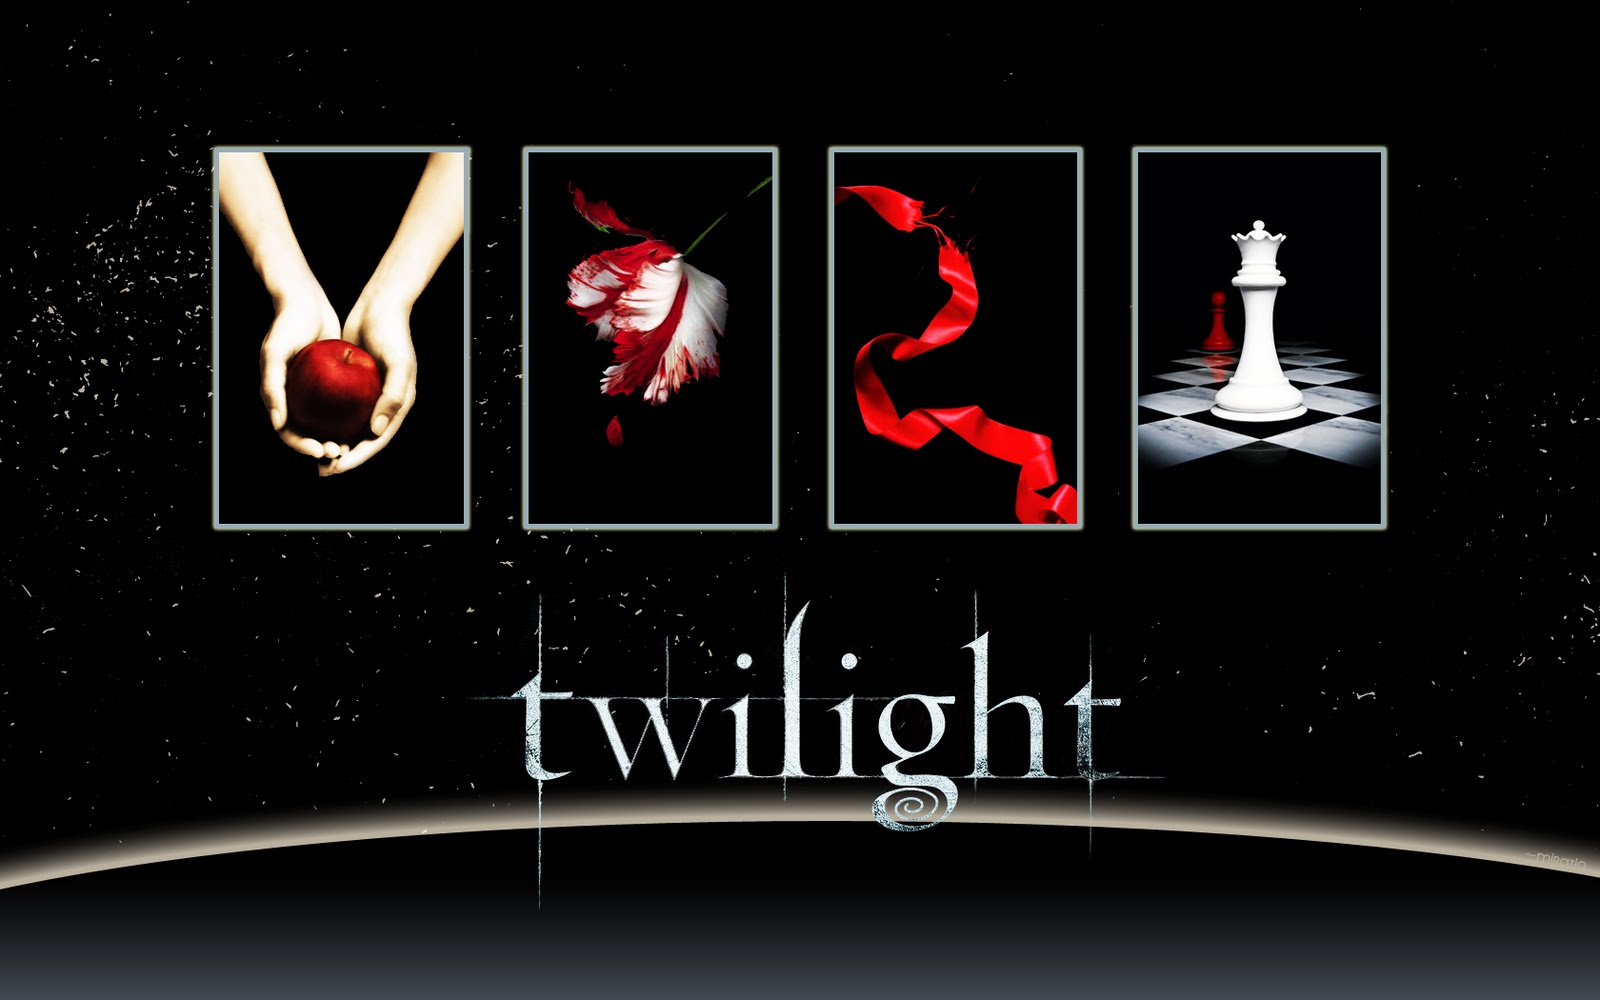 http://3.bp.blogspot.com/_1vUNXHyn99I/SxWvK_bIJZI/AAAAAAAAHsM/fS1STlRst3A/s1600/Twilight_Saga__Books_Wallpaper_by_miratio.jpg